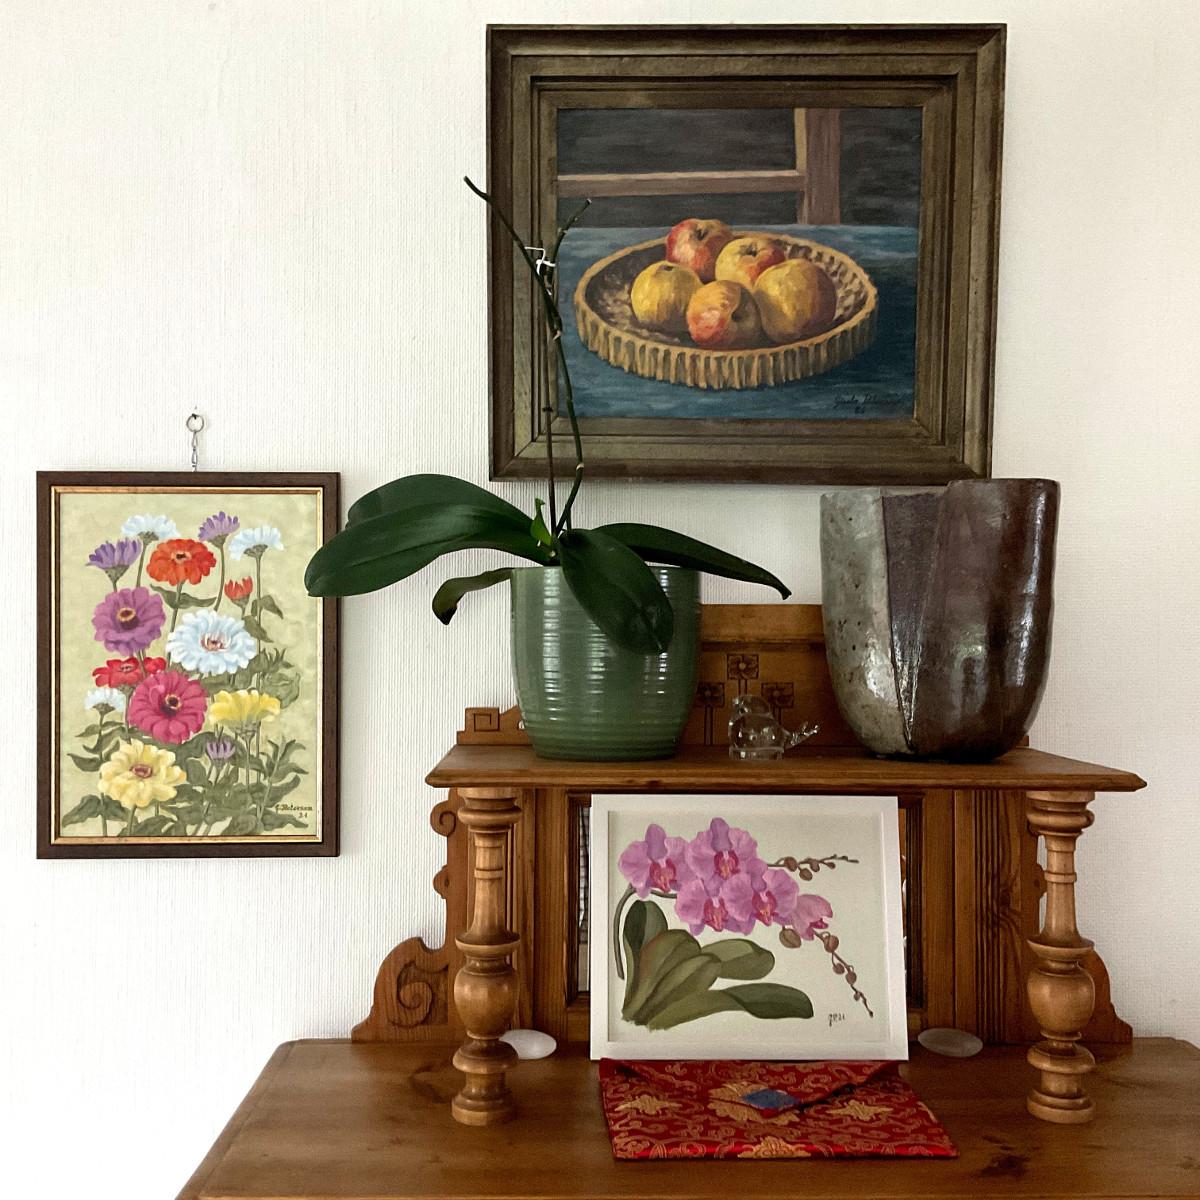 Zinnien, Orchidee, Äpfel